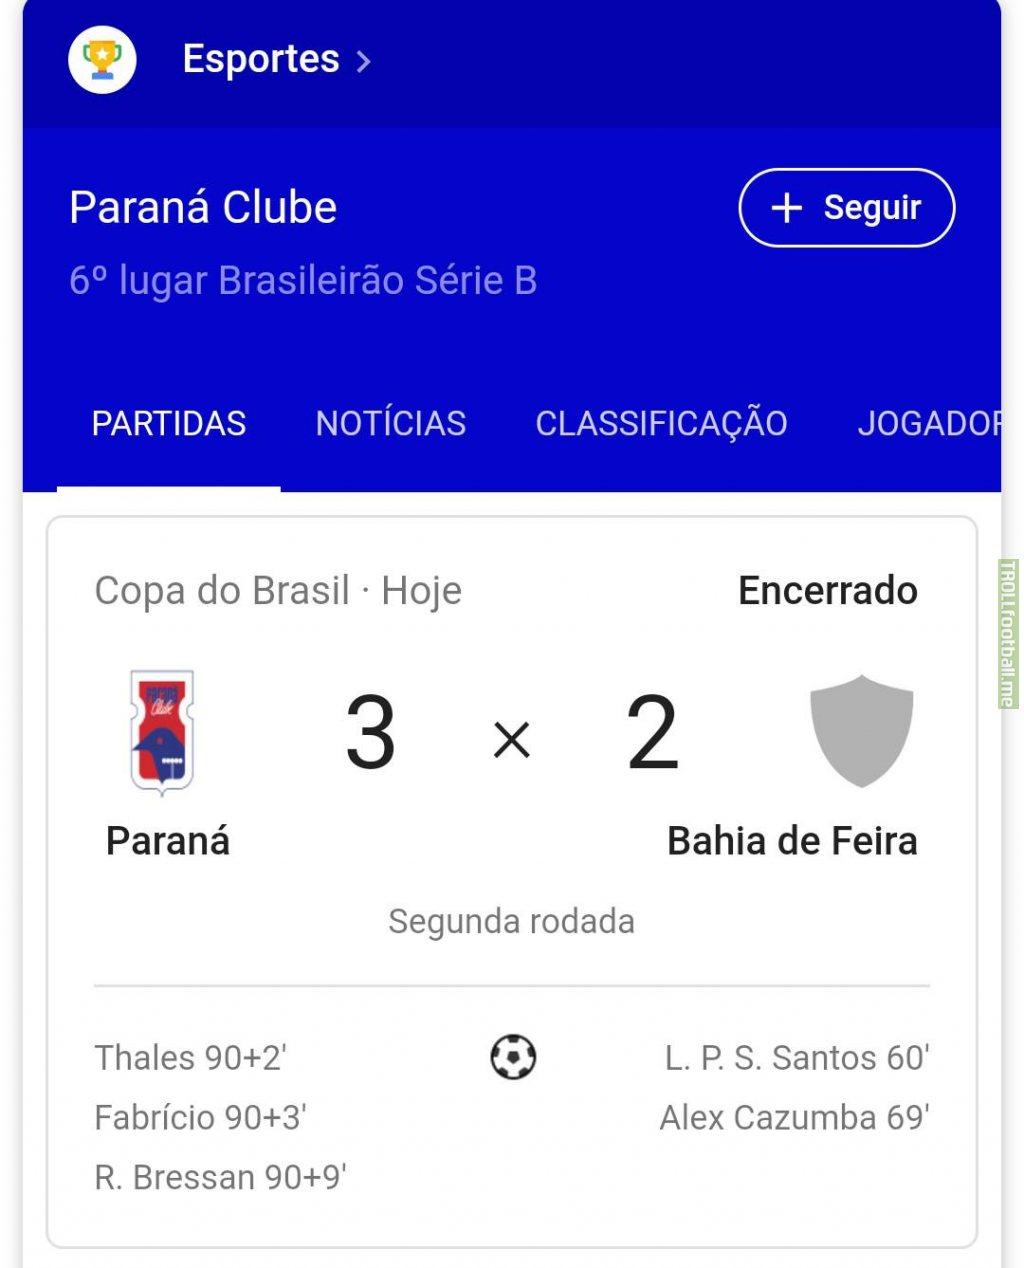 Paraná Clube overtime comeback over Bahia de Feira (Brazil National Cup)